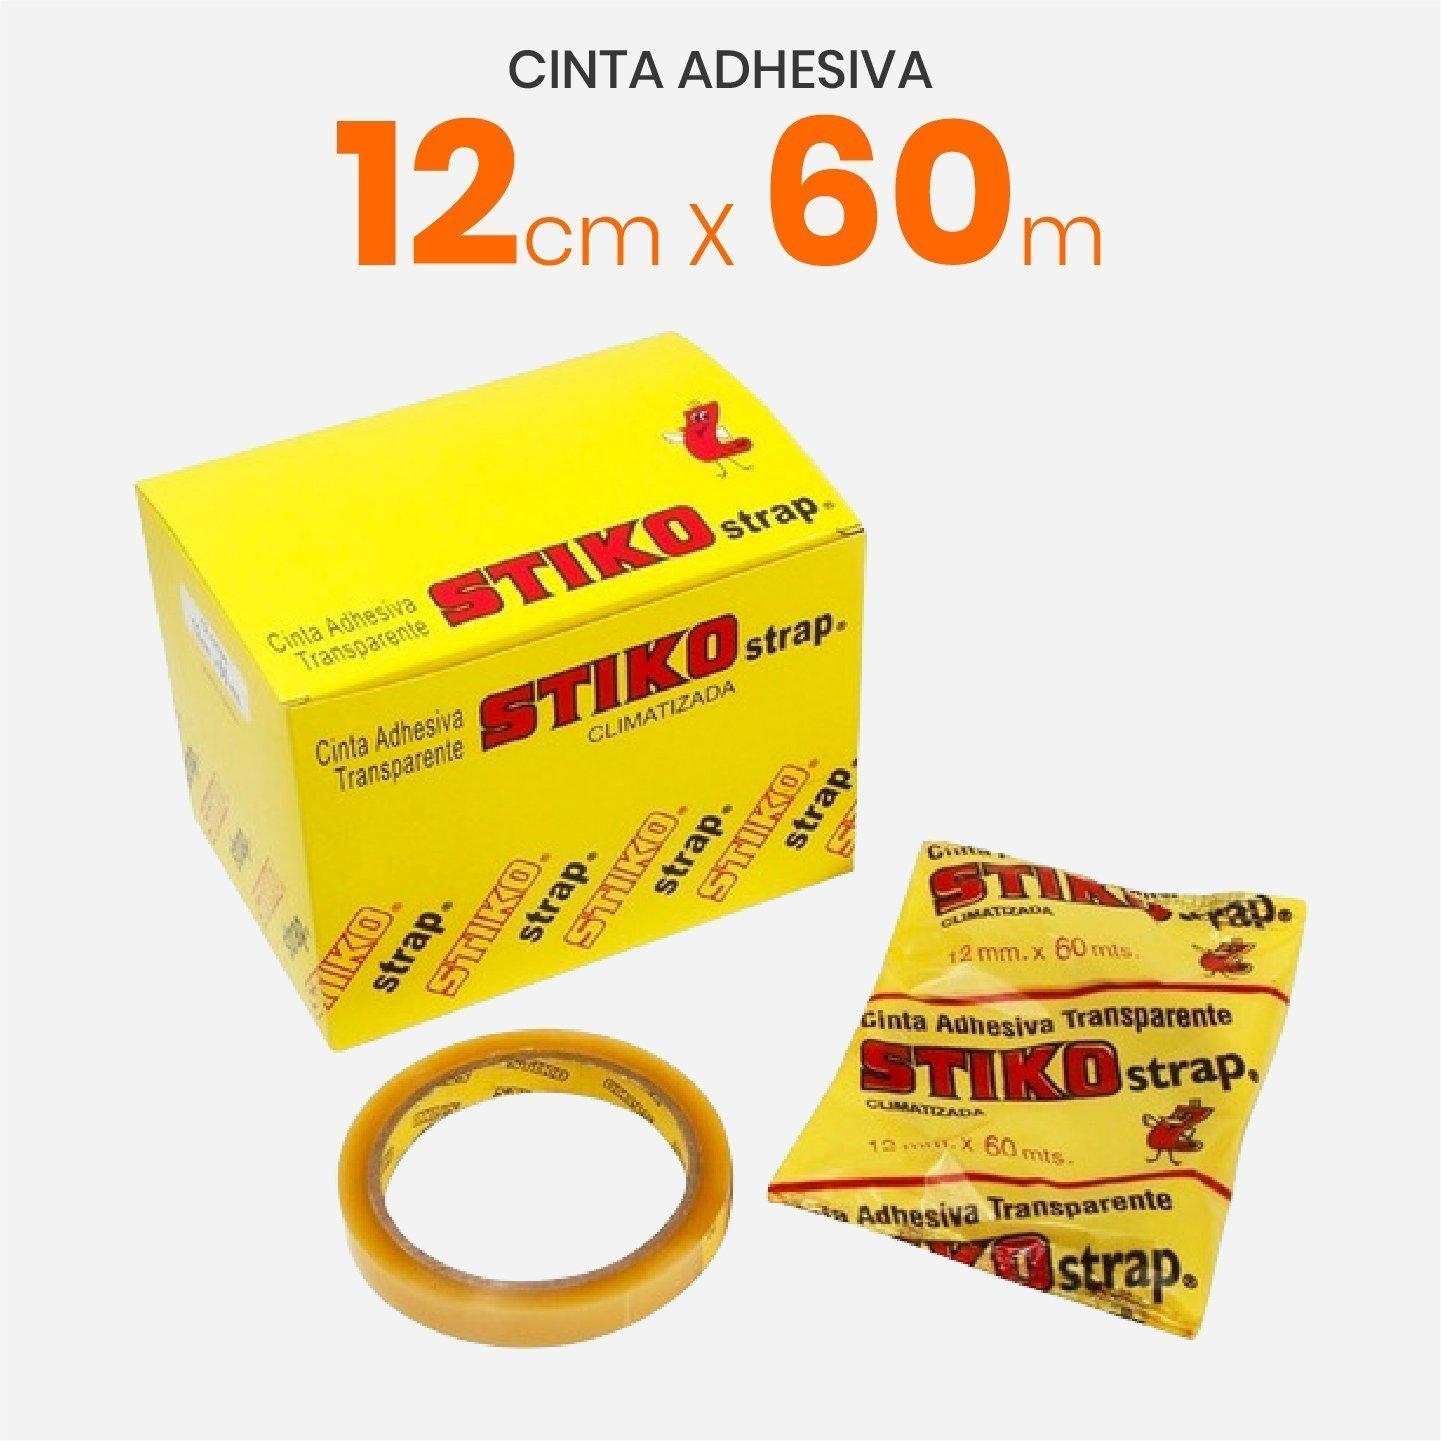 Cinta Adhesiva Transparente Stiko 12mm x 60mts